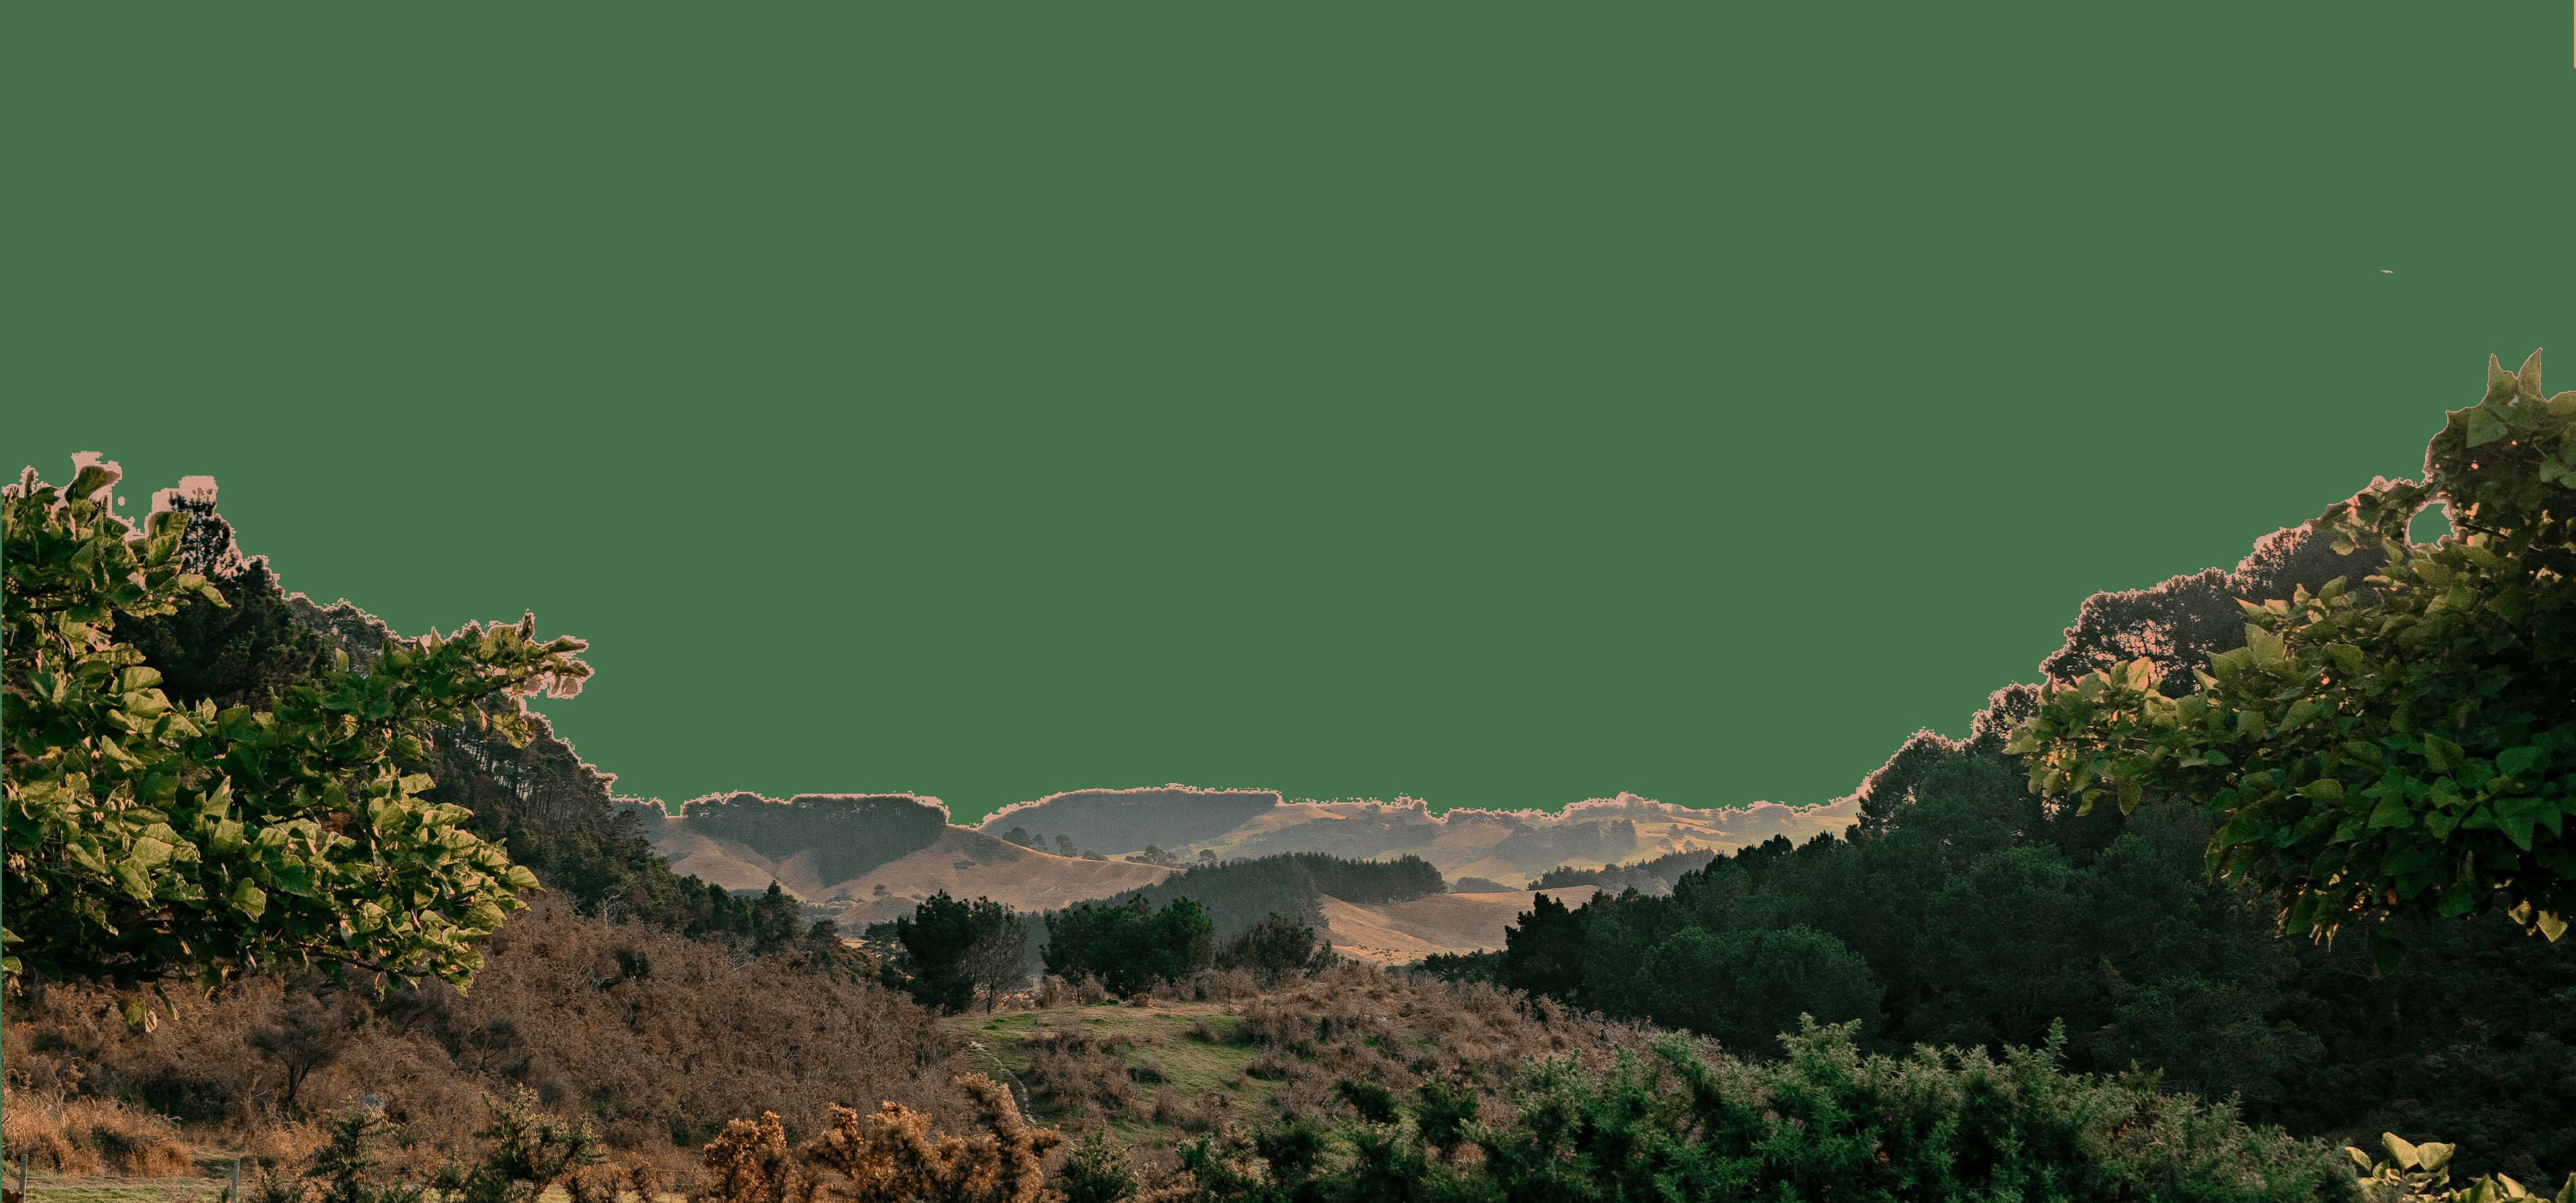 A sunset view of Coromandel hills